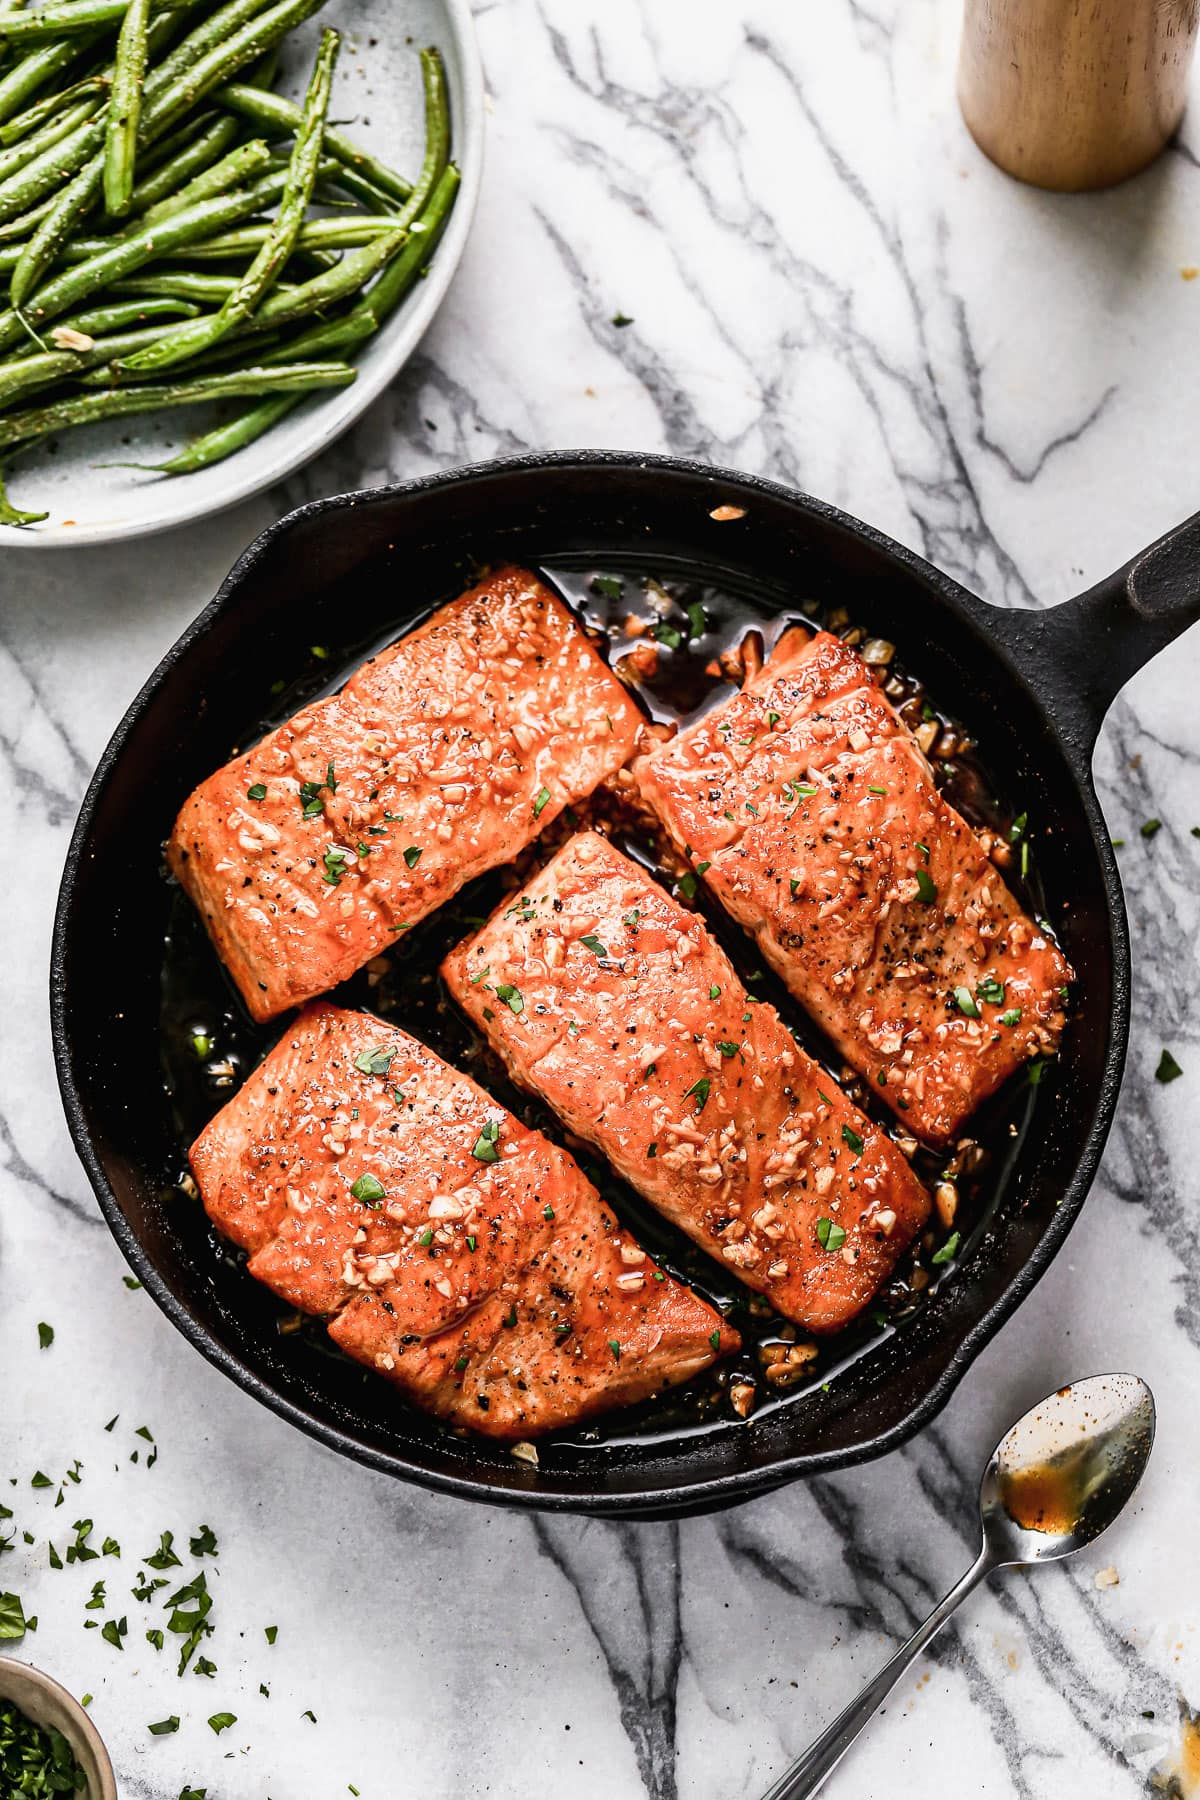 Easy honey garlic salmon fillets in a skillet